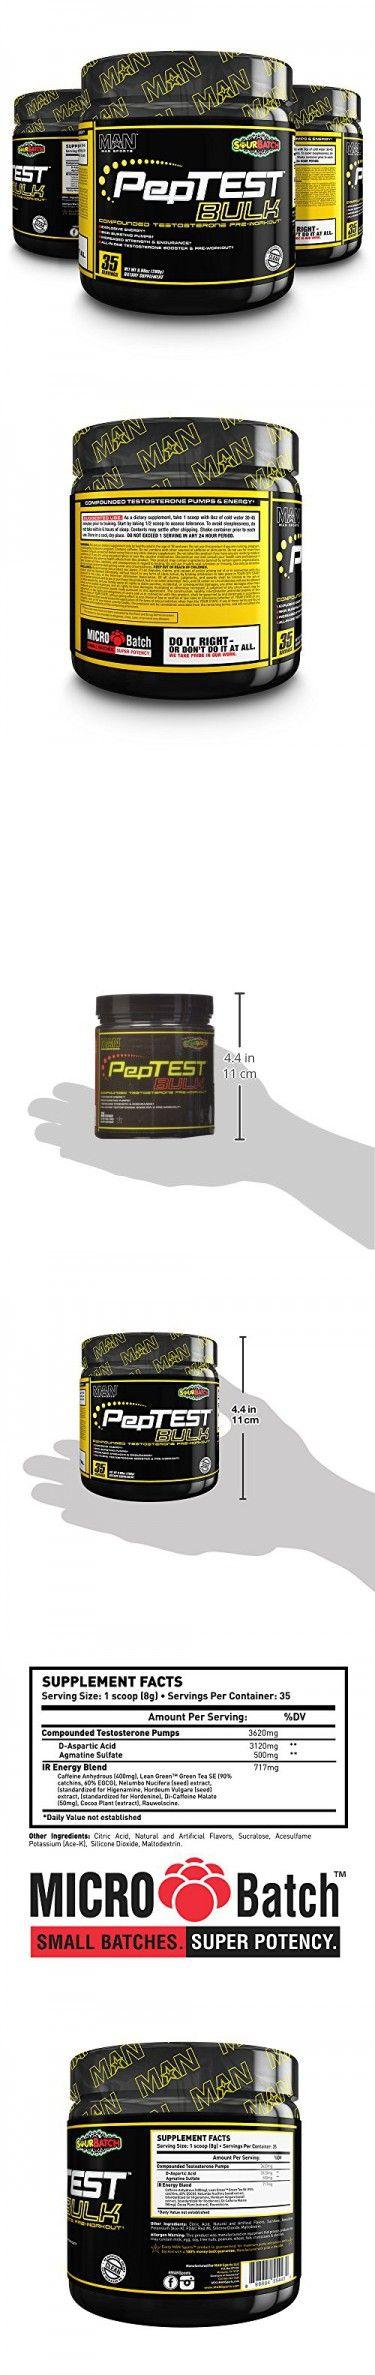 MAN Sports PepTest BULK 2-in-1 Pre-Workout + Testosterone